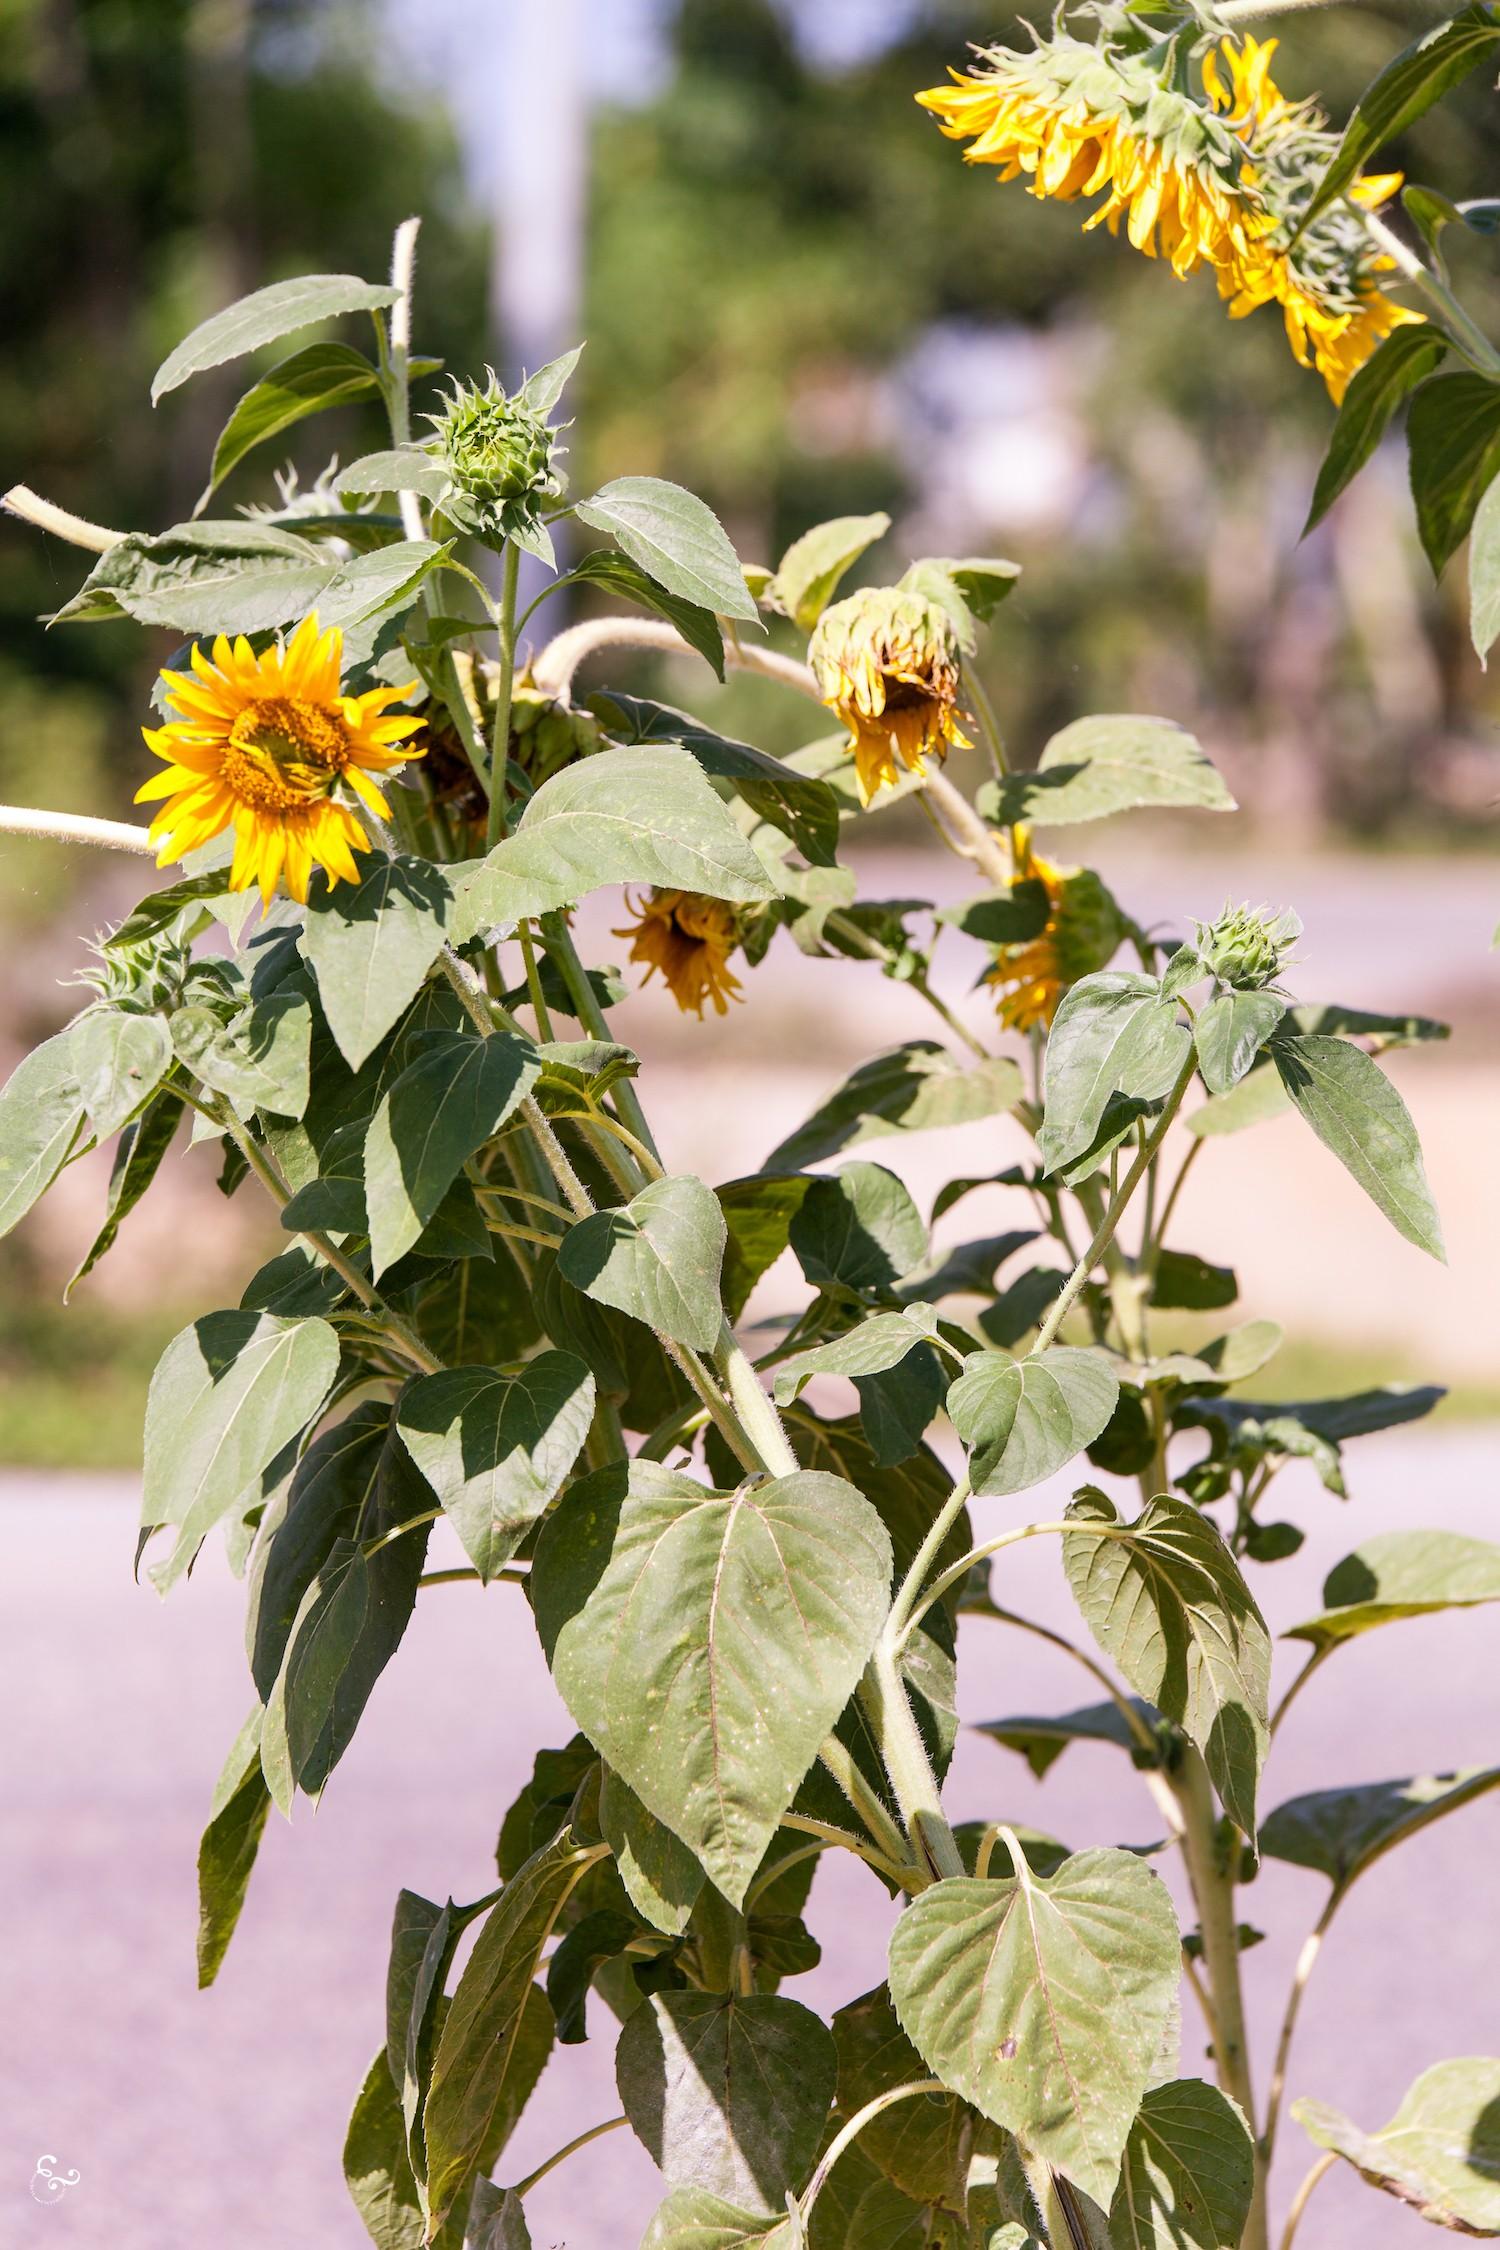 Nowhere & Everywhere Centre Renovation Ethical Labor Garden Plants Cambodia Basil